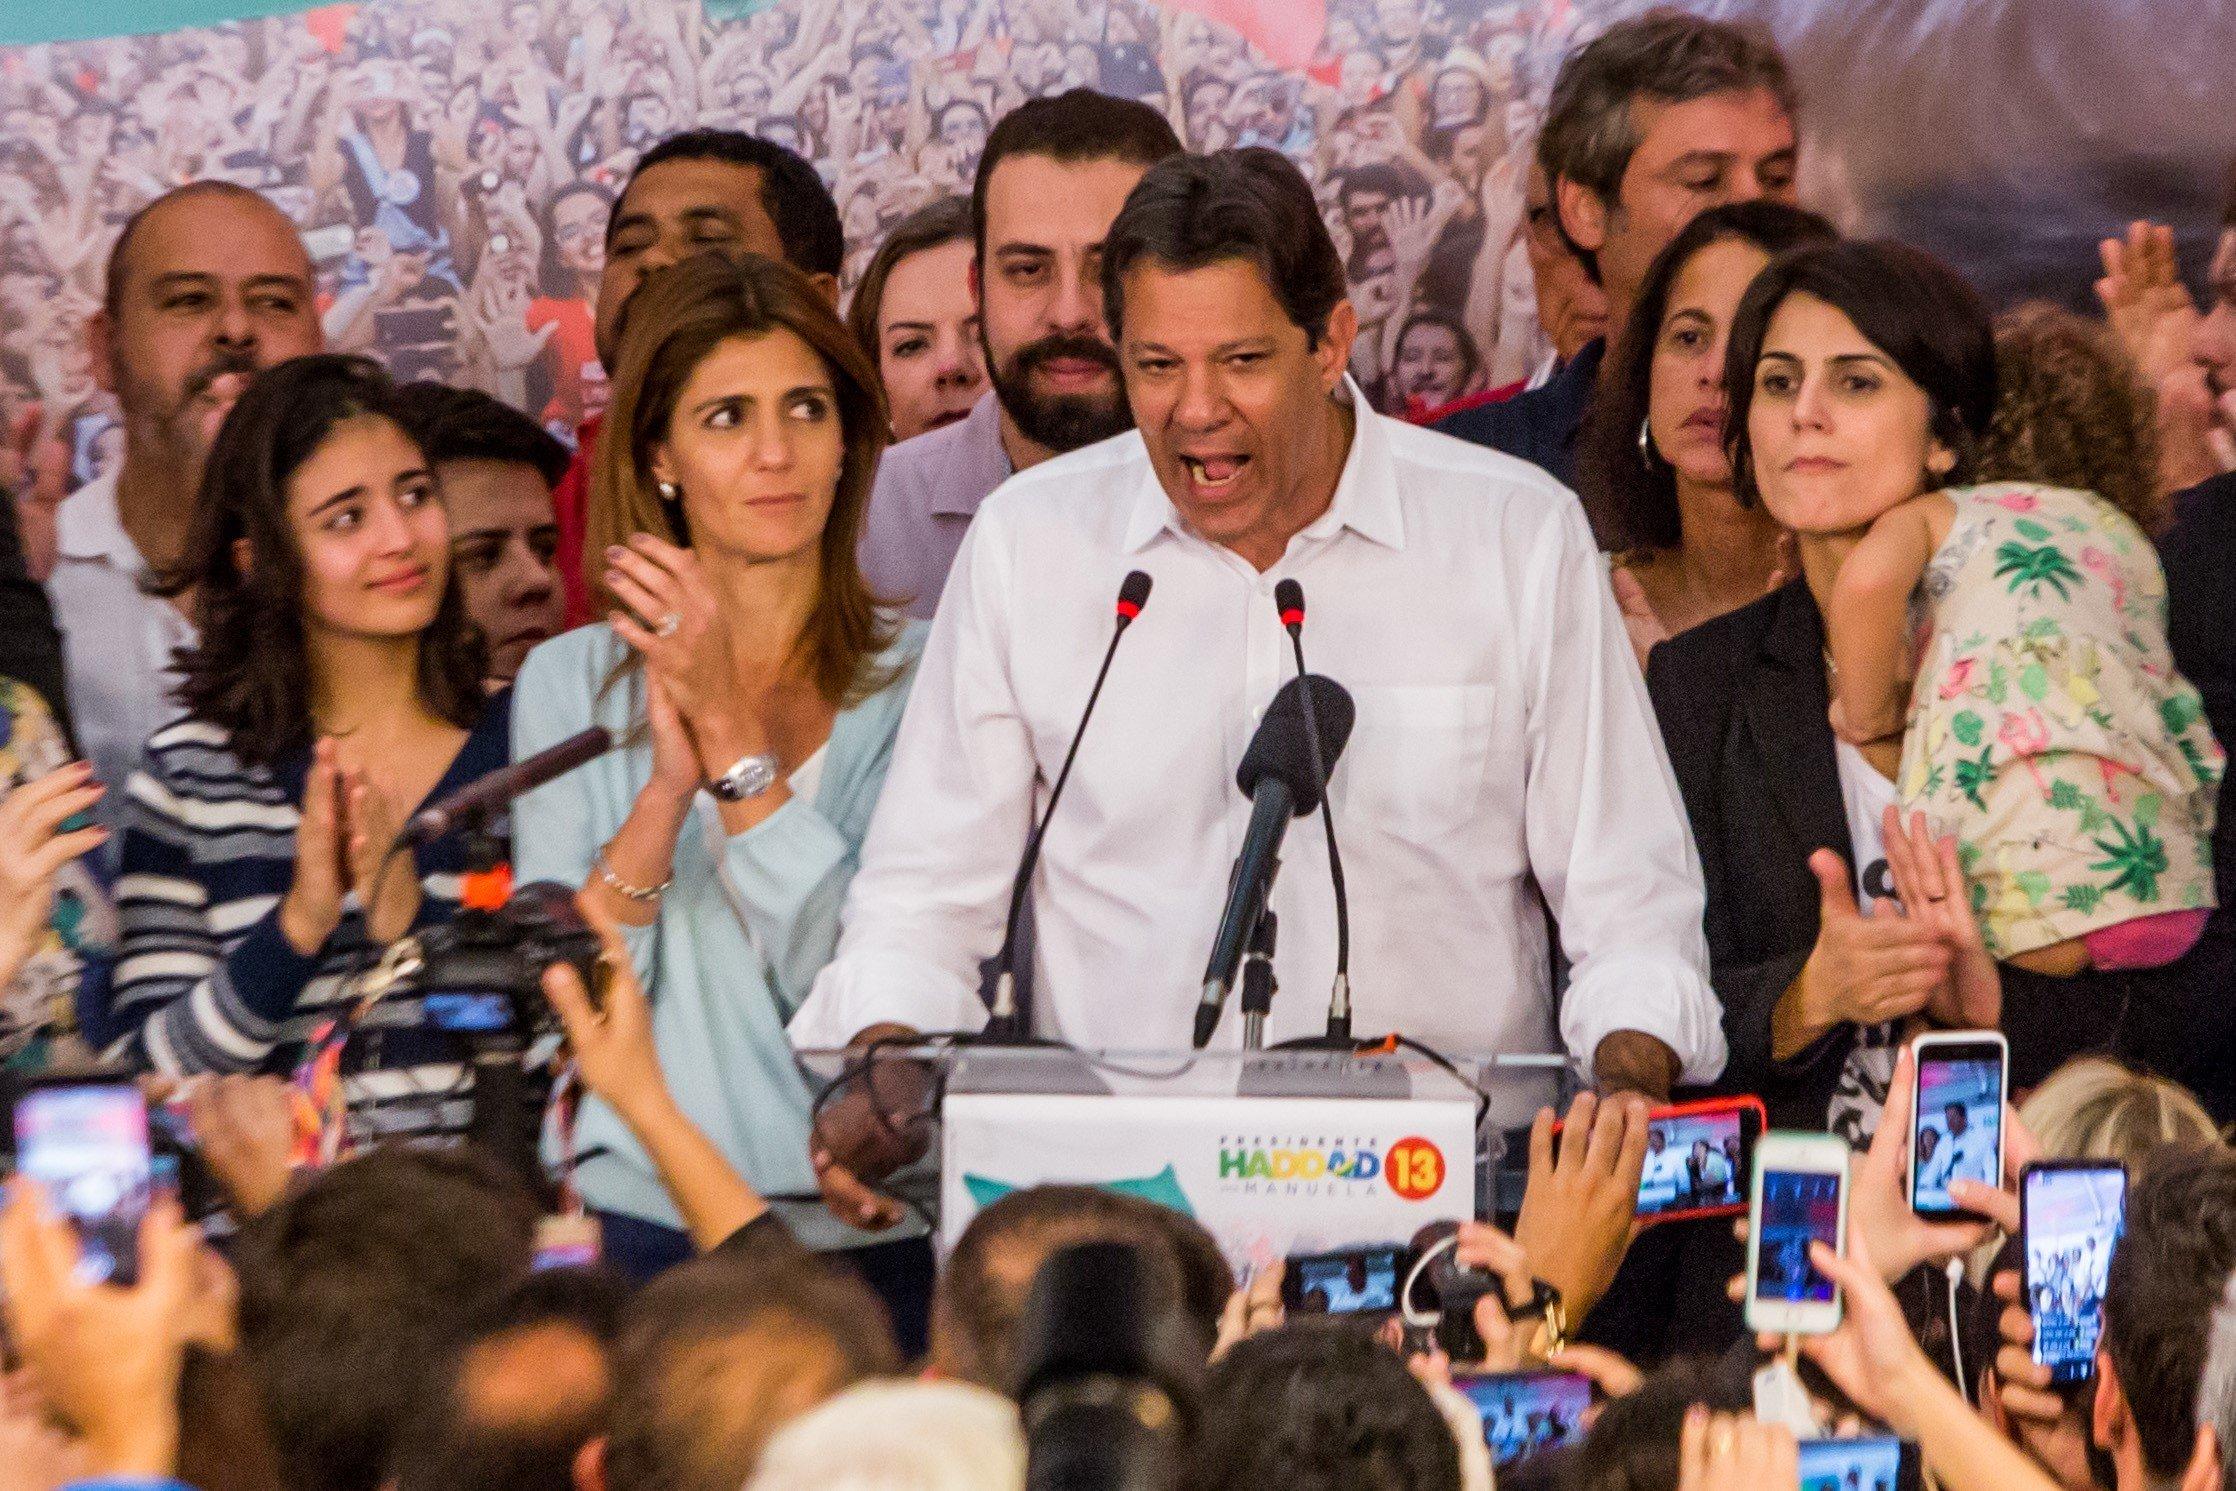 Jair Bolsonaro's Victory Sparks Fears In Brazil's LGBTQ Community